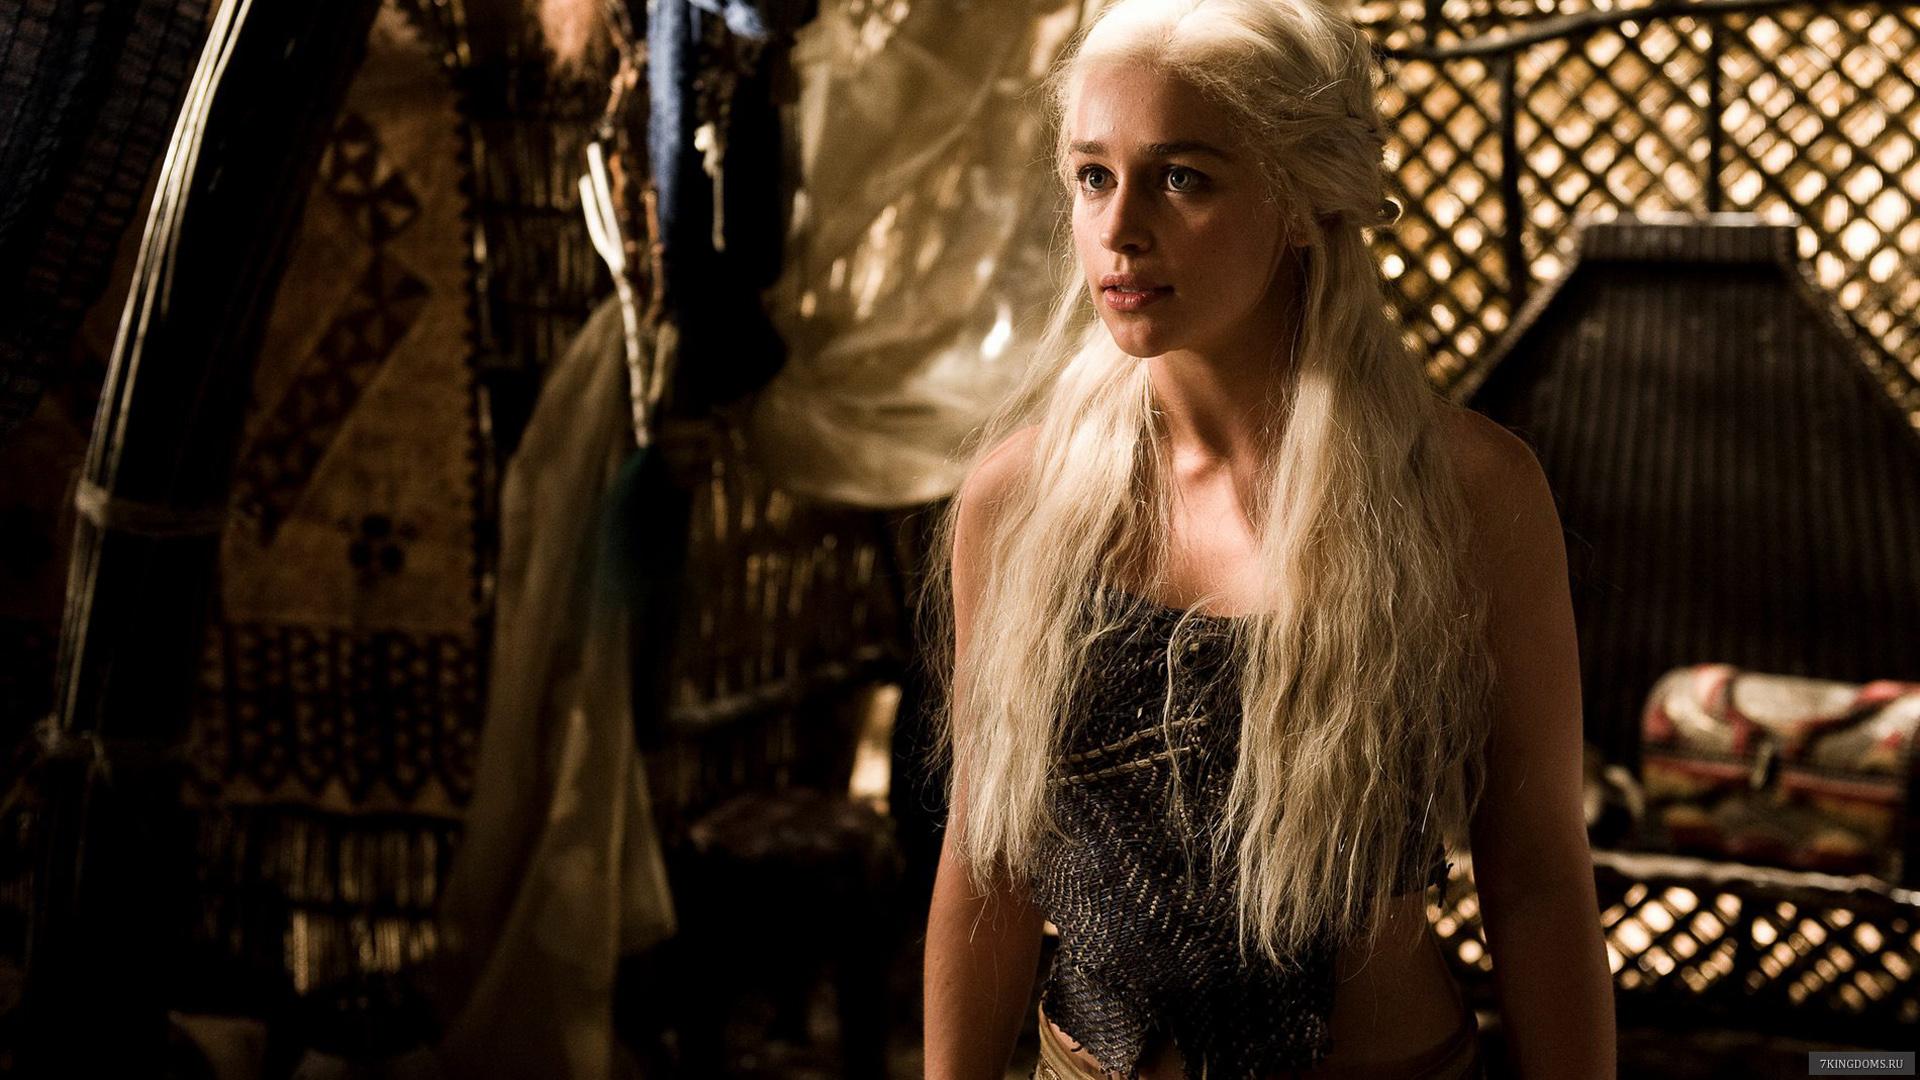 Daenerys Emilia Clarke Game Of Thrones - HD Wallpaper